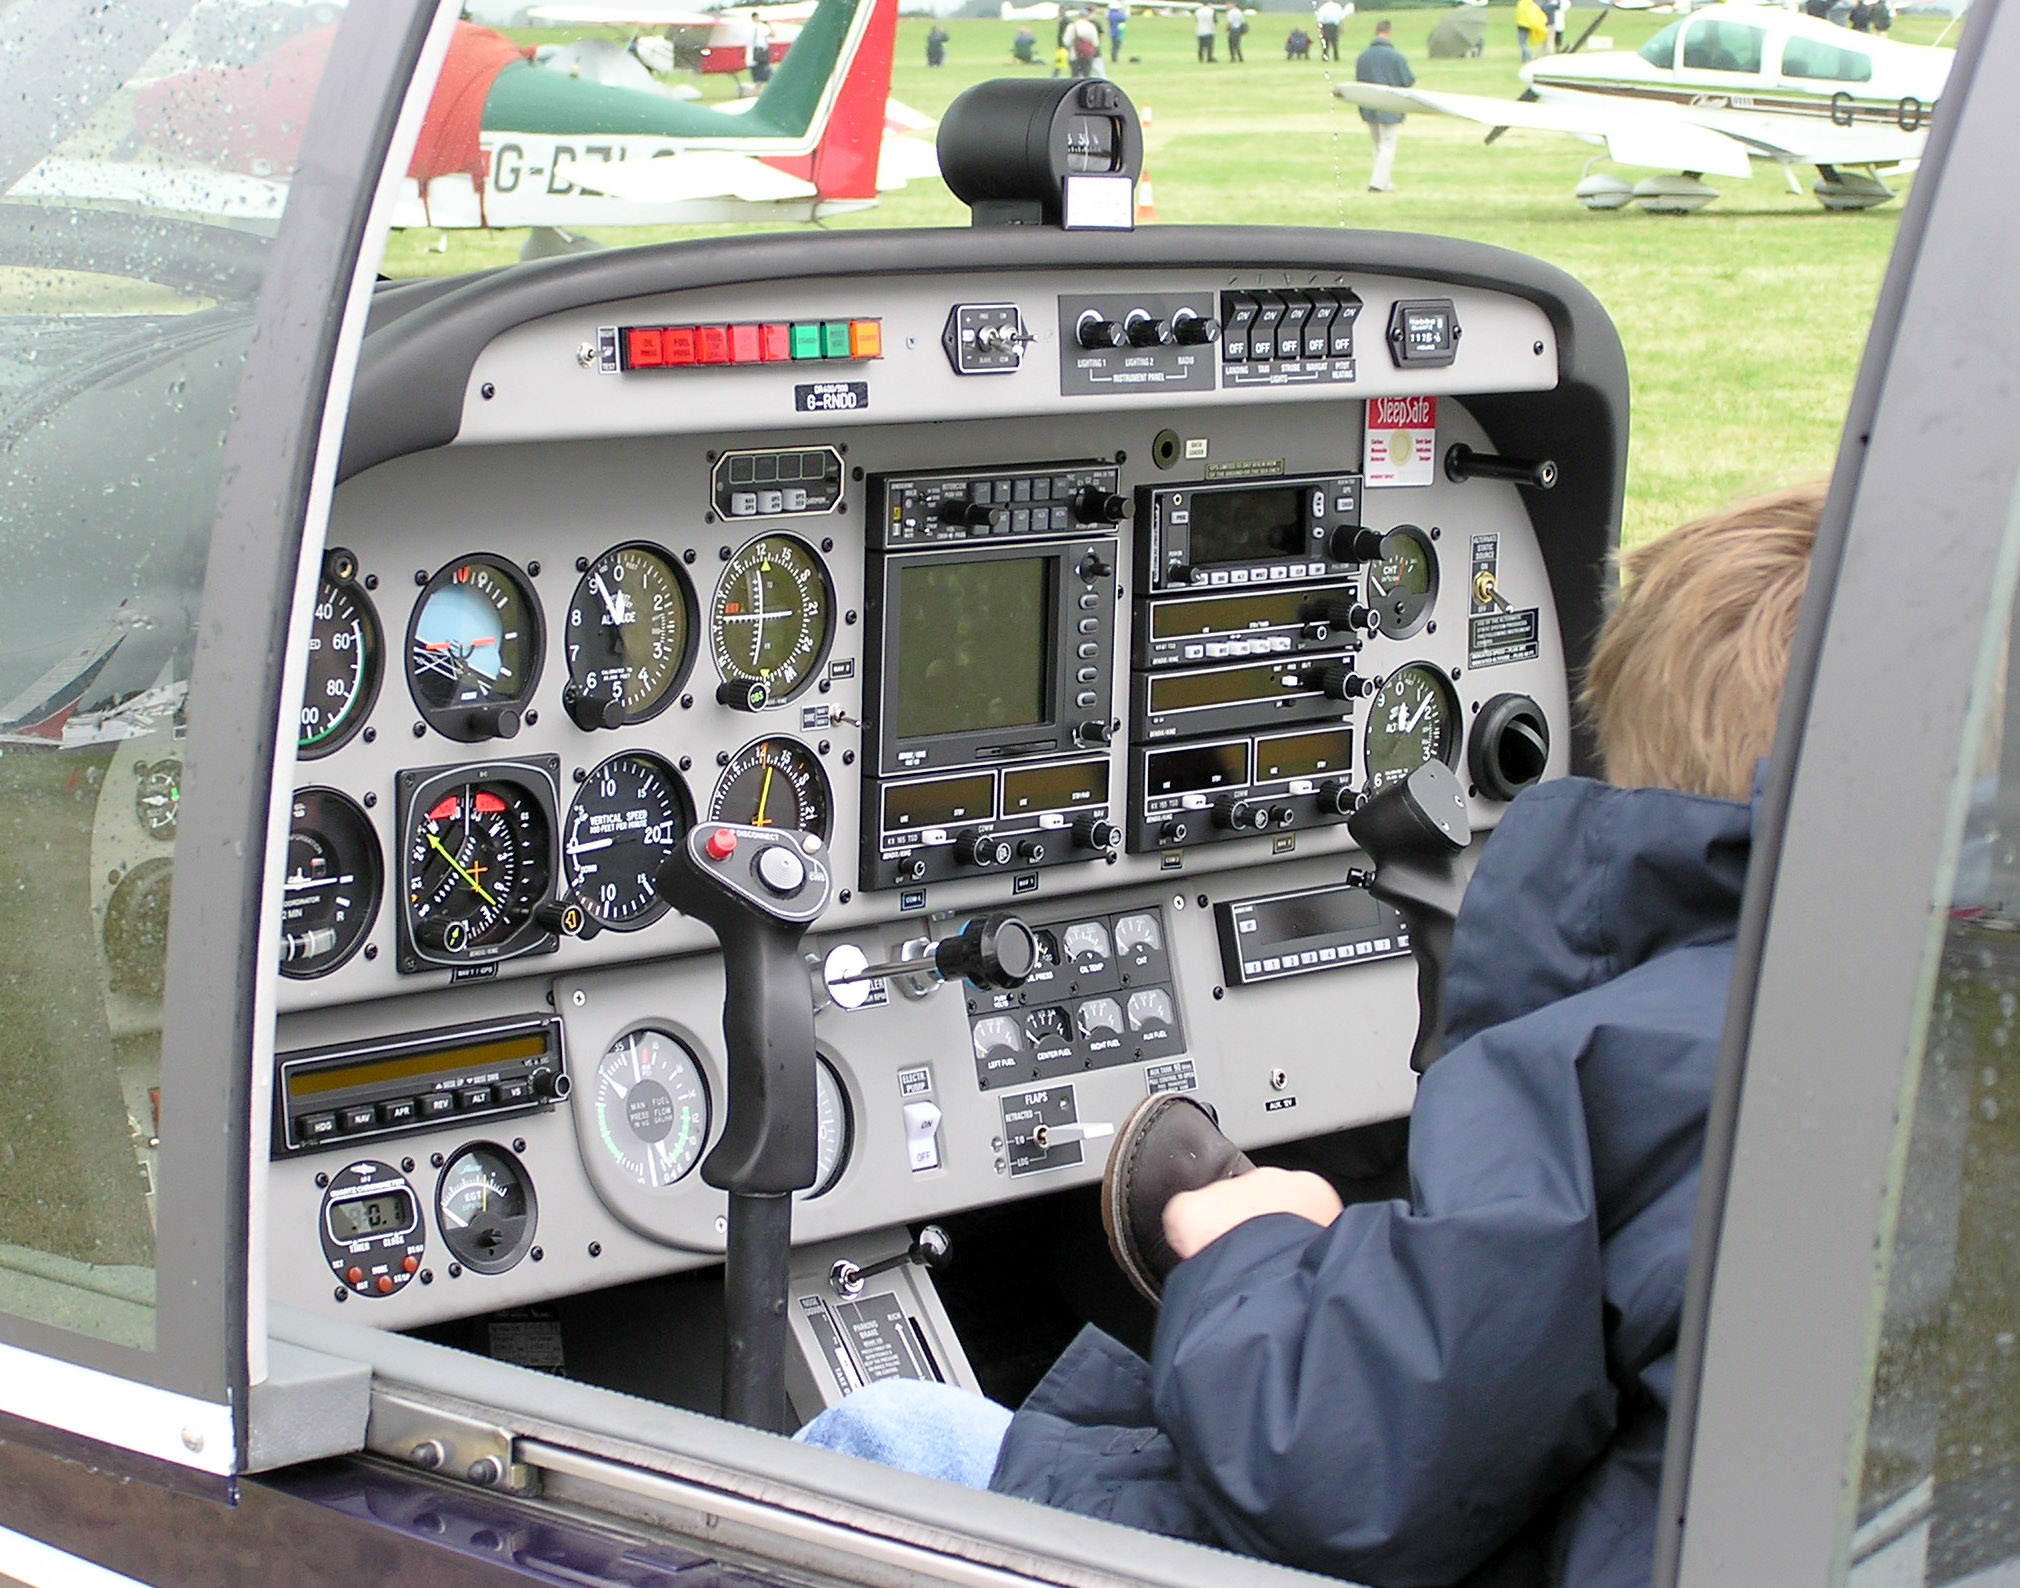 Light Sport bet at home tv en direct nowe konto bet at home bonus code Aircraft